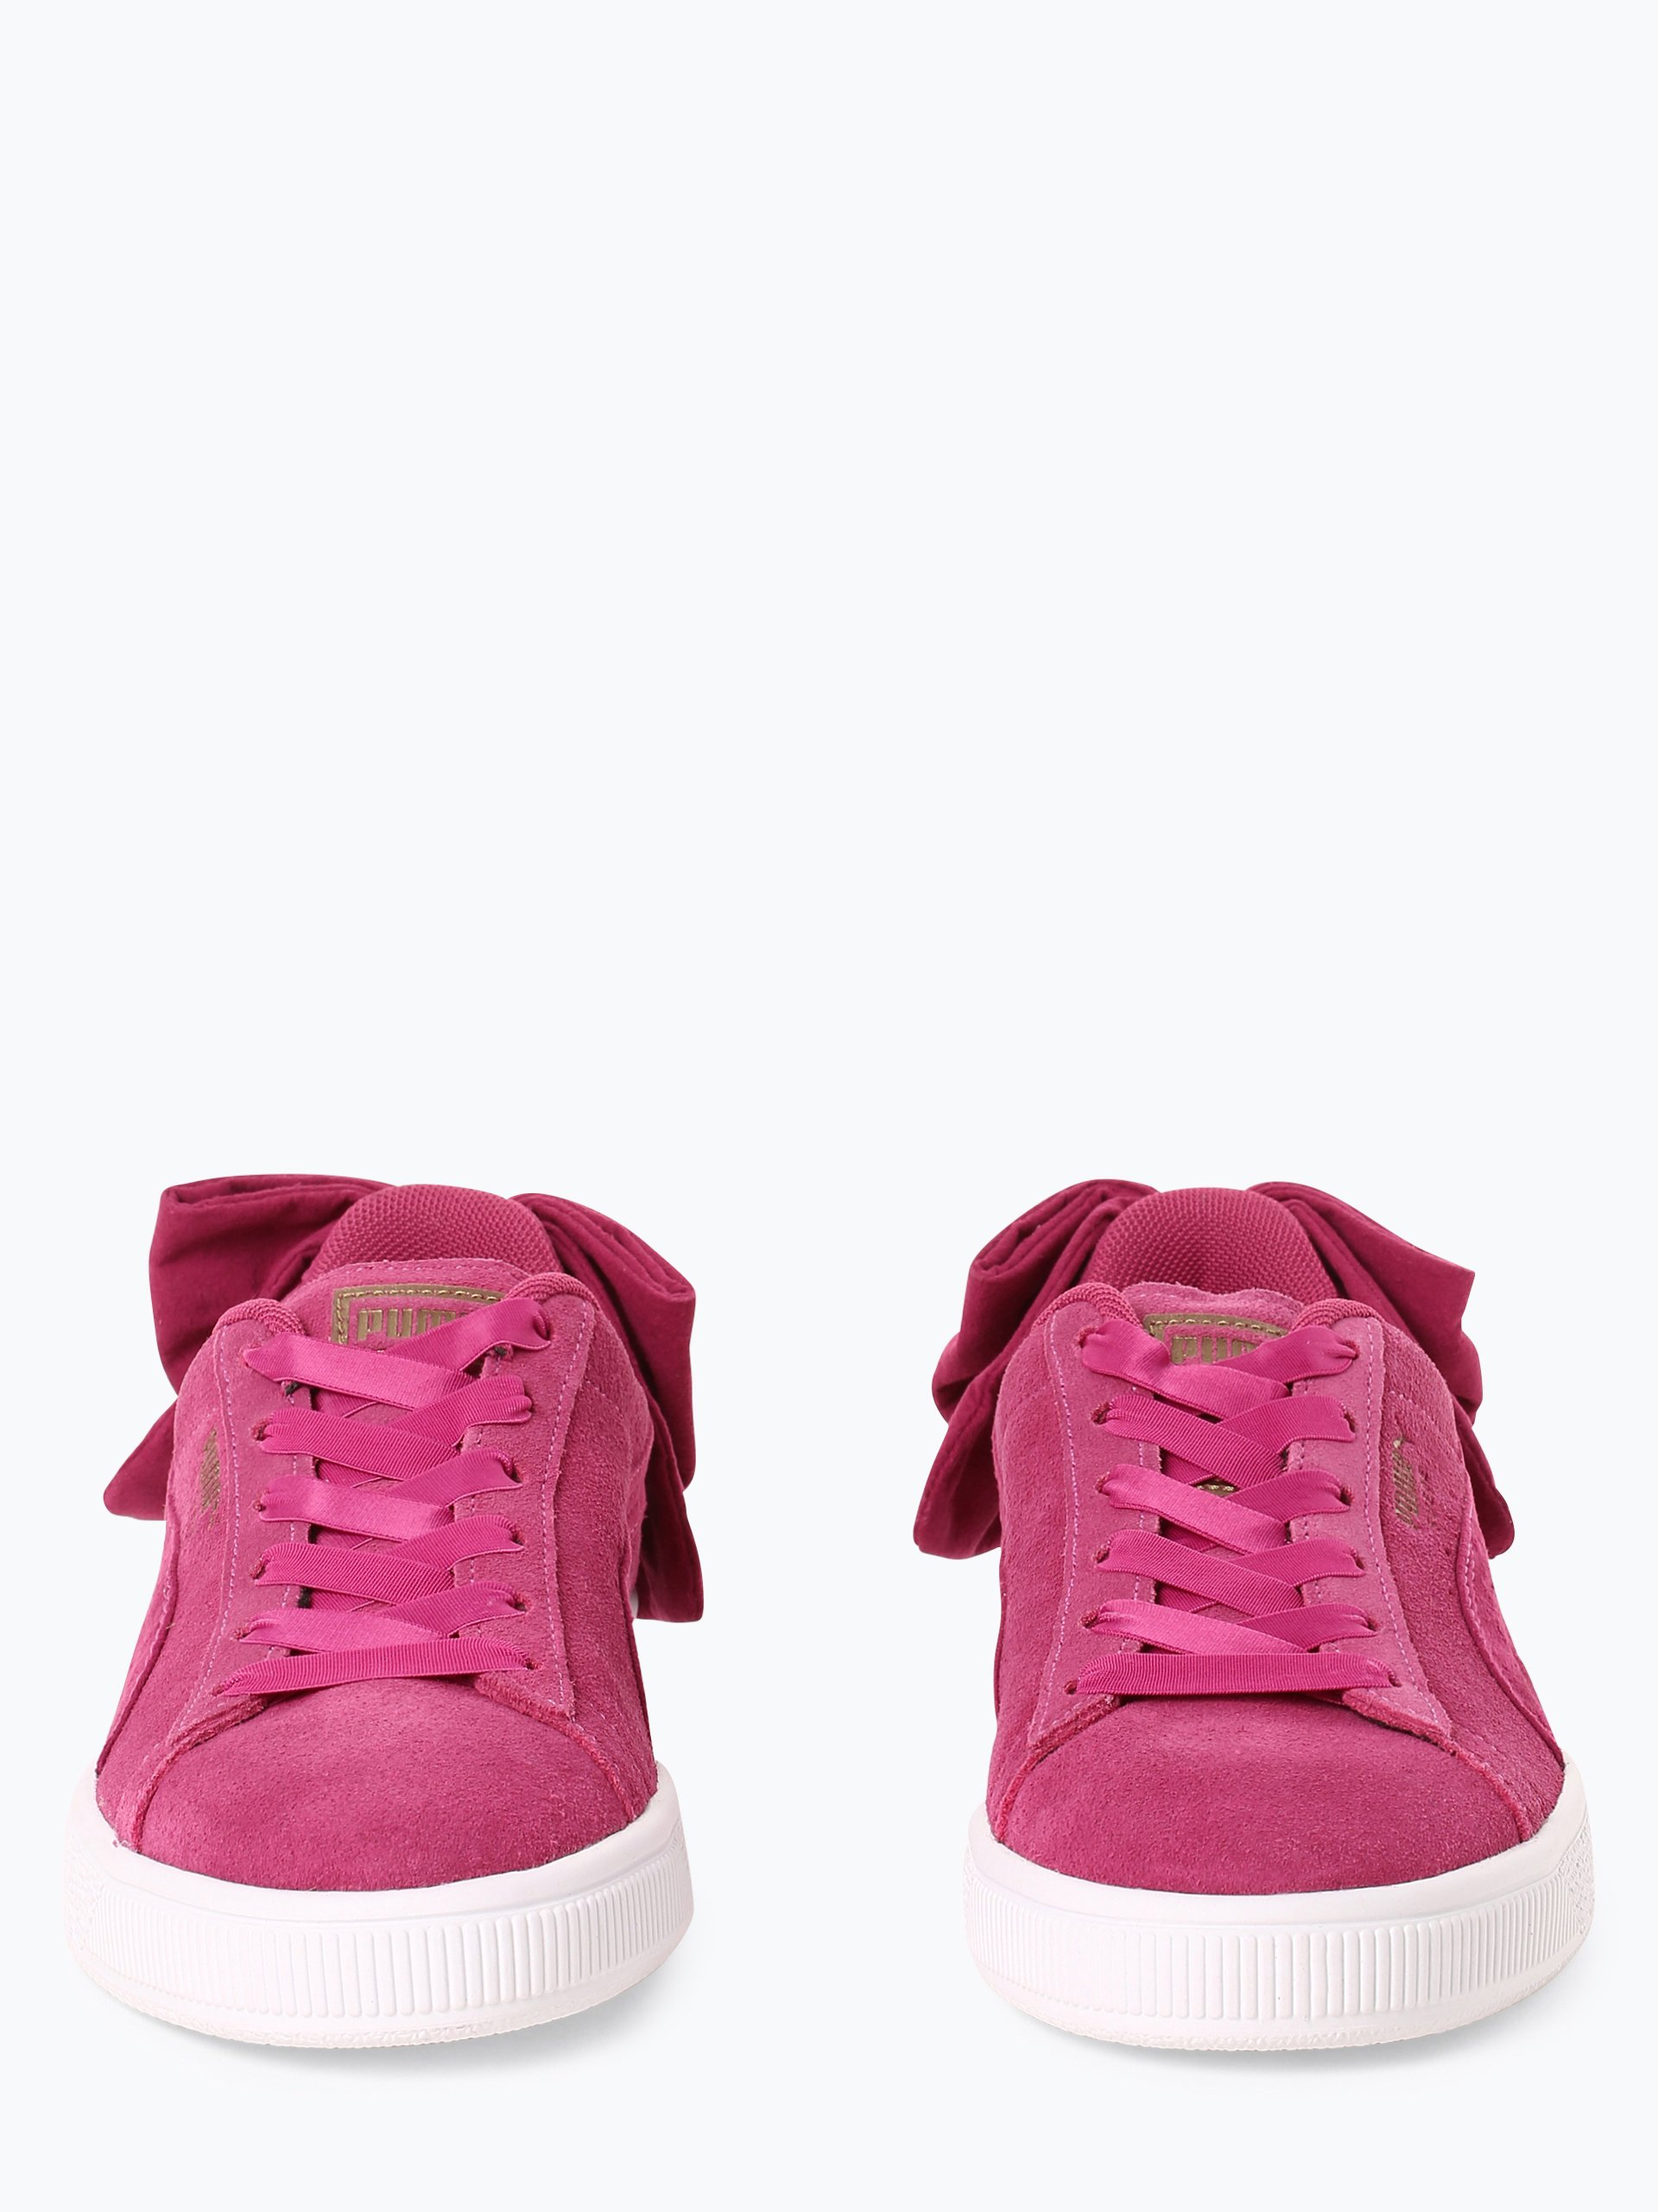 Puma Damen Sneaker aus Leder - Suede Bow